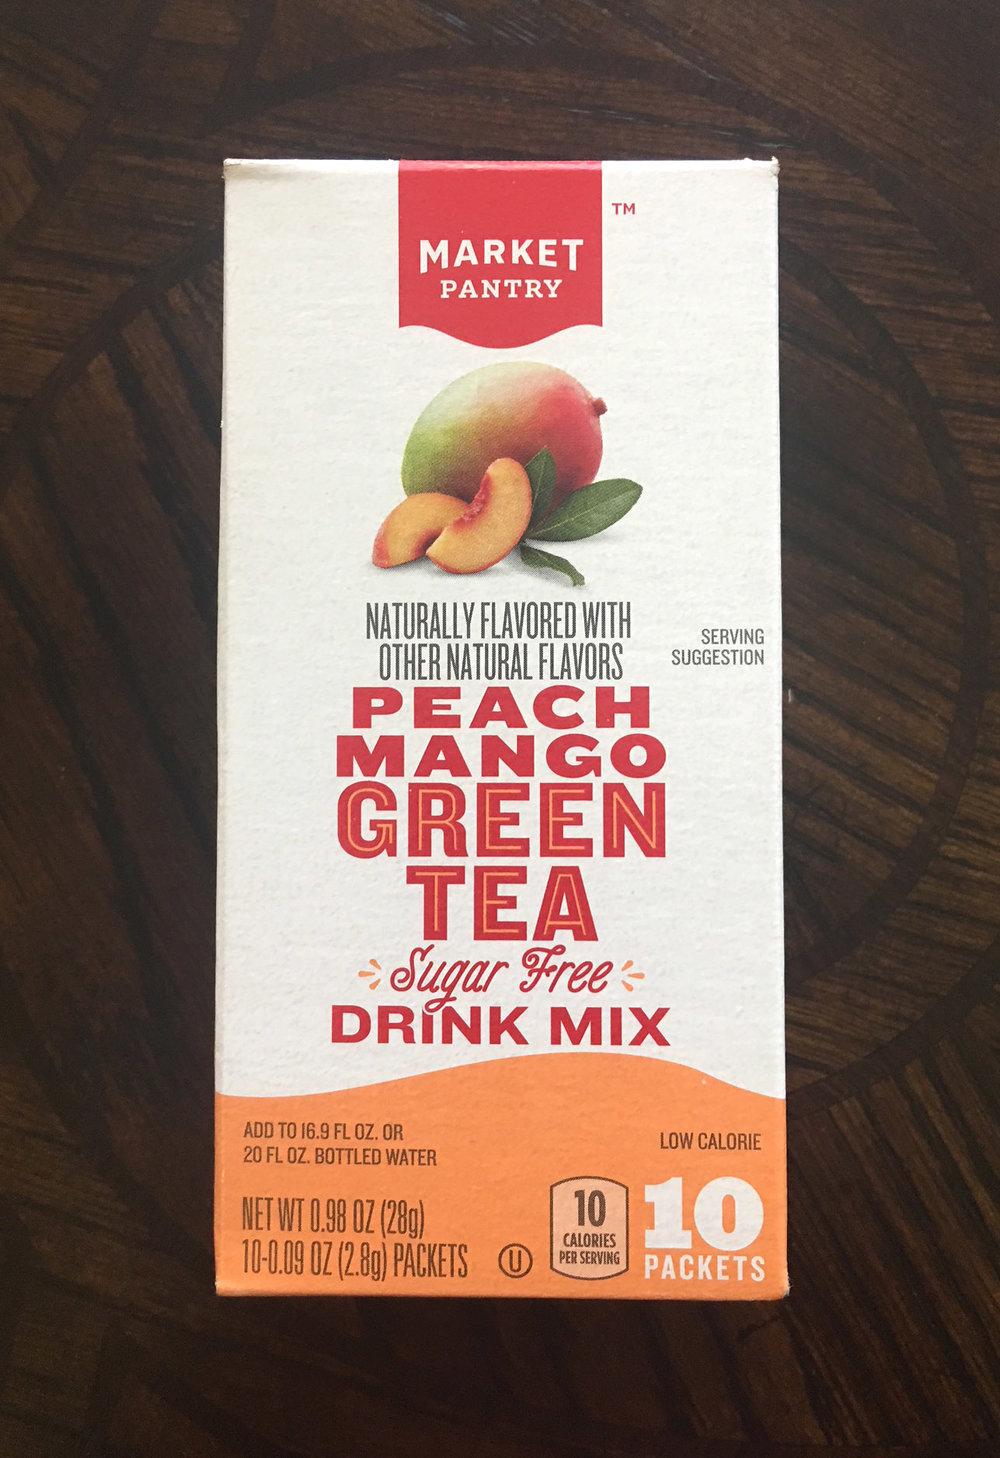 // MARKET PANTRY - Peach Mango Green Tea Sugar Free Drink Mix